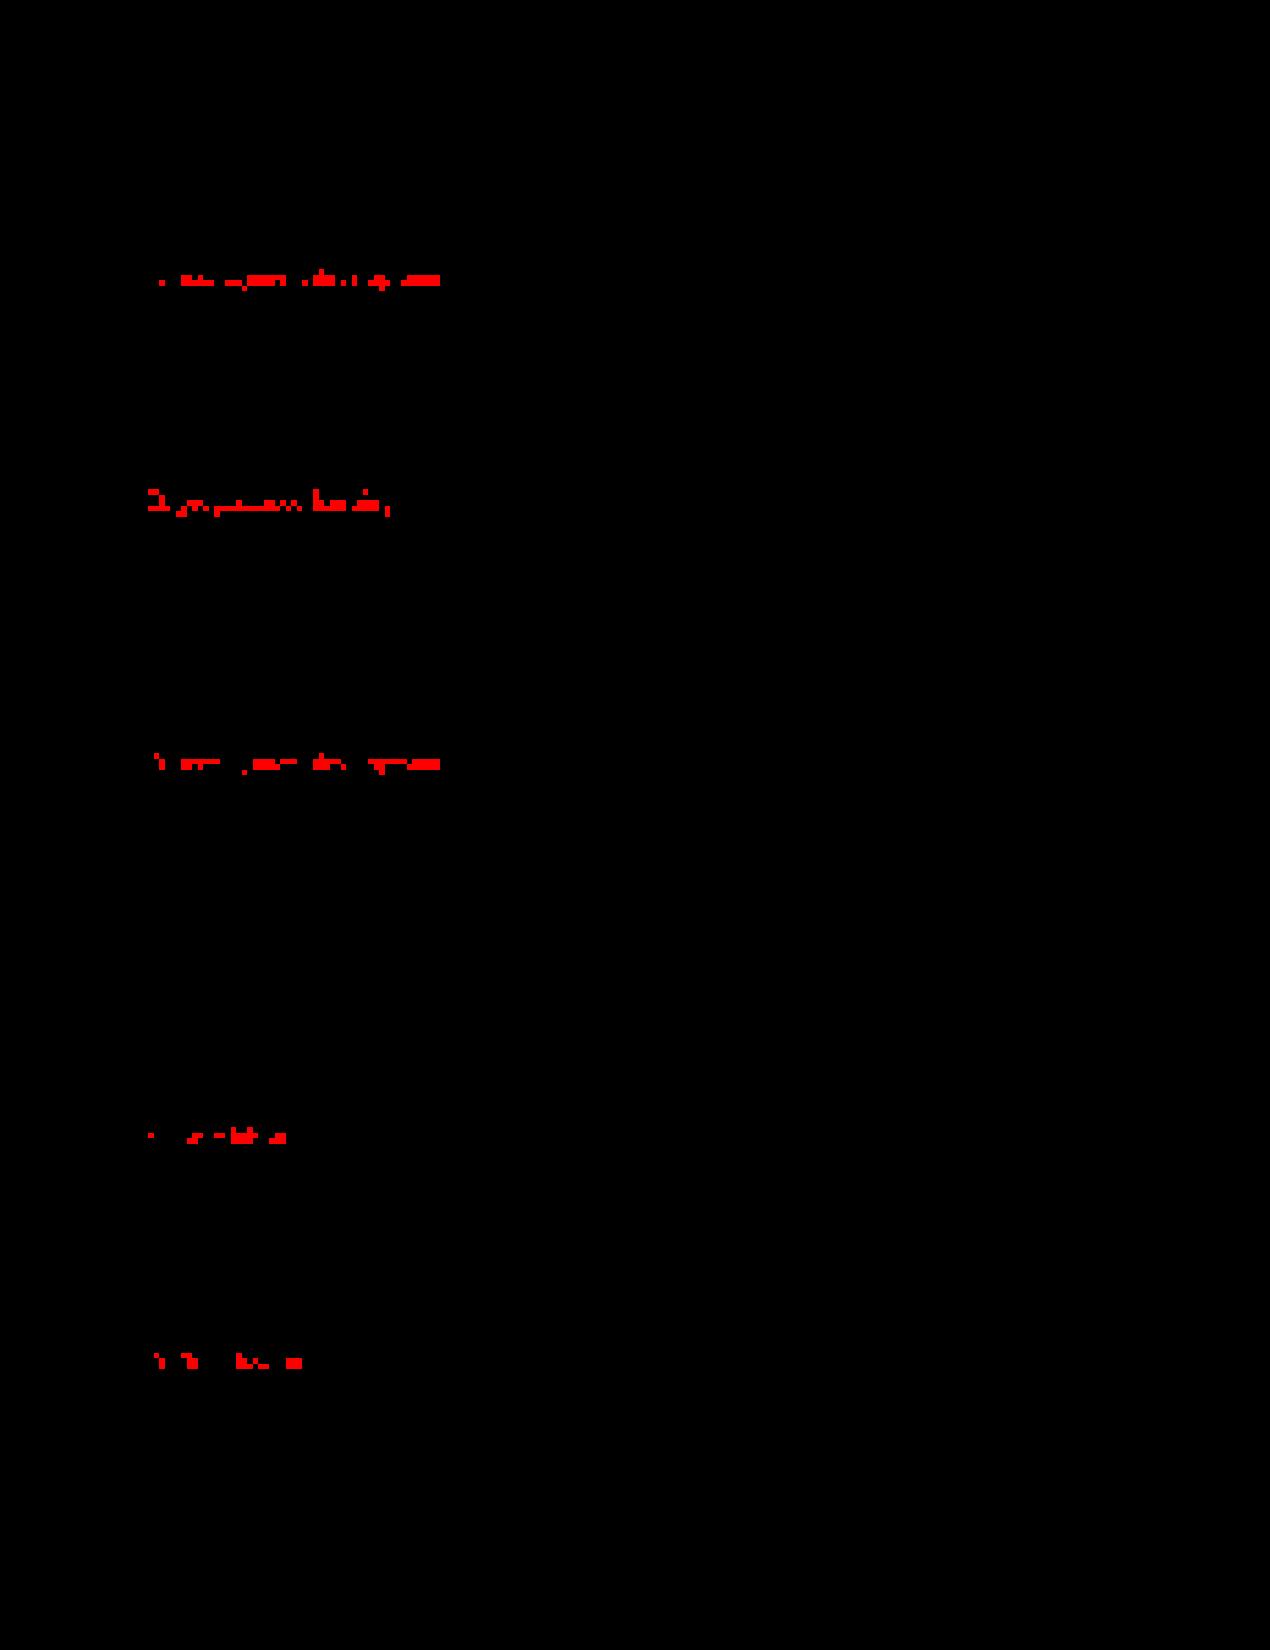 SOLUTION: ASHWORTH COLLEGE BZ420 ONLINE EXAM 3 2016 - Studypool on job letter, cv form, contact form, cover letter form, job vacancy, job openings, job payment receipt, job resume, job advertisement, job search, agreement form, job opportunity, job requirements, job applications you can print, job applications online, employee benefits form,